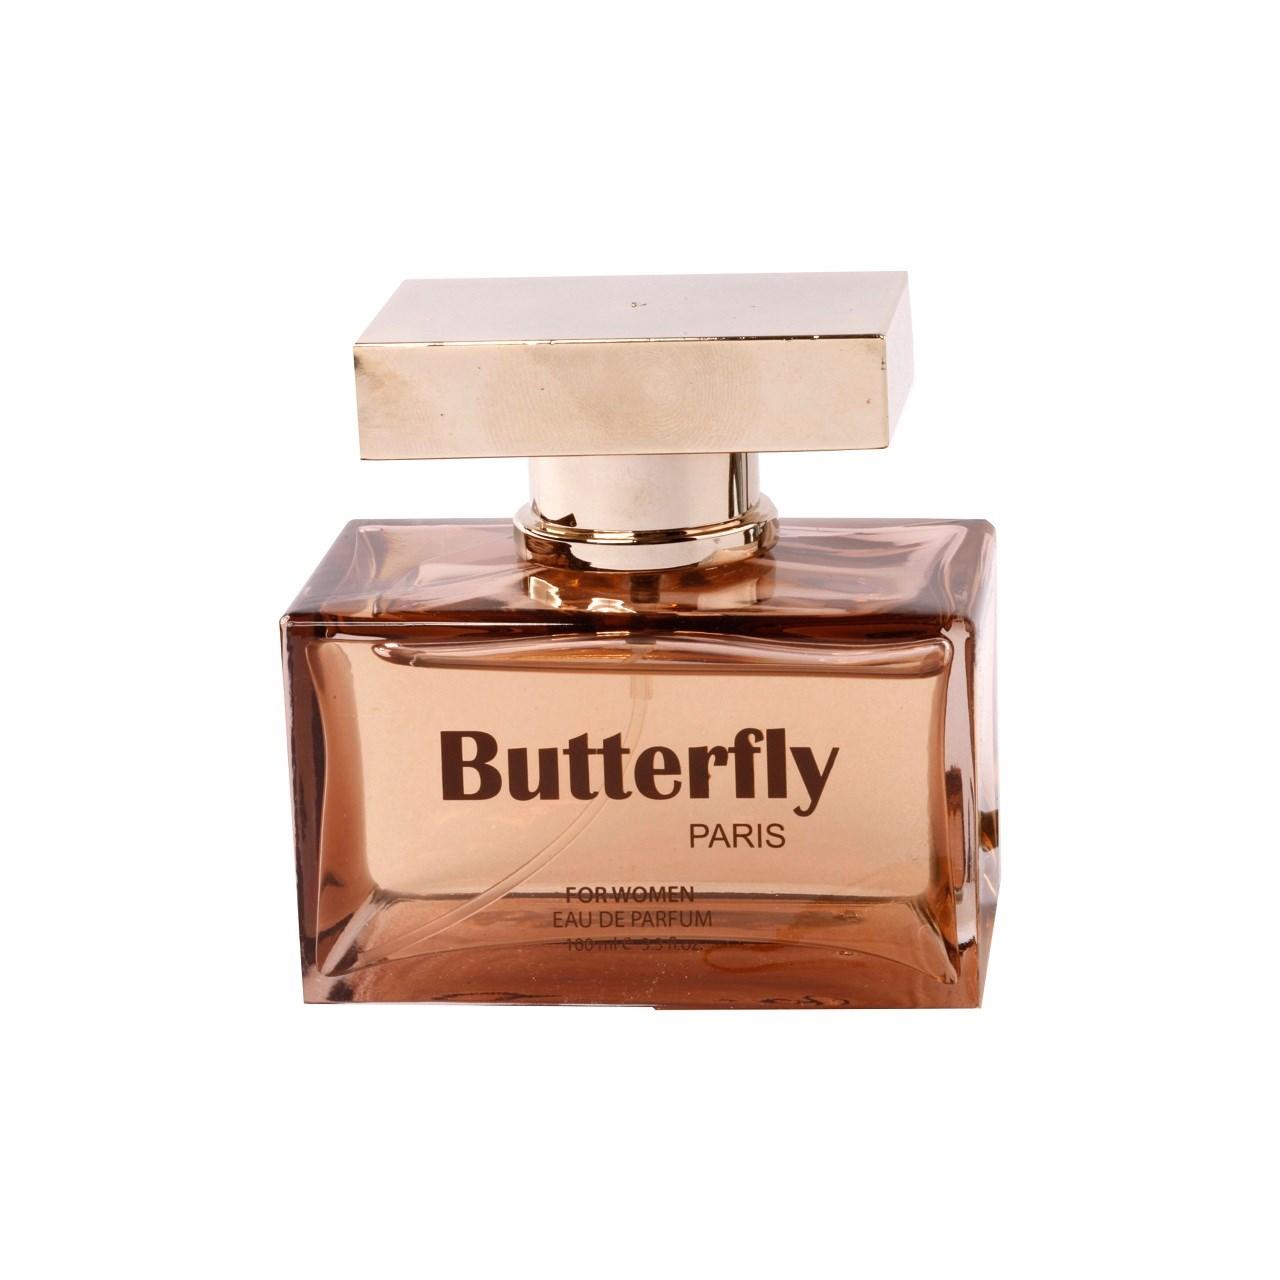 ادوپرفیوم زنانه سمفونی مدل Butterfly حجم 100 میلی لیتر